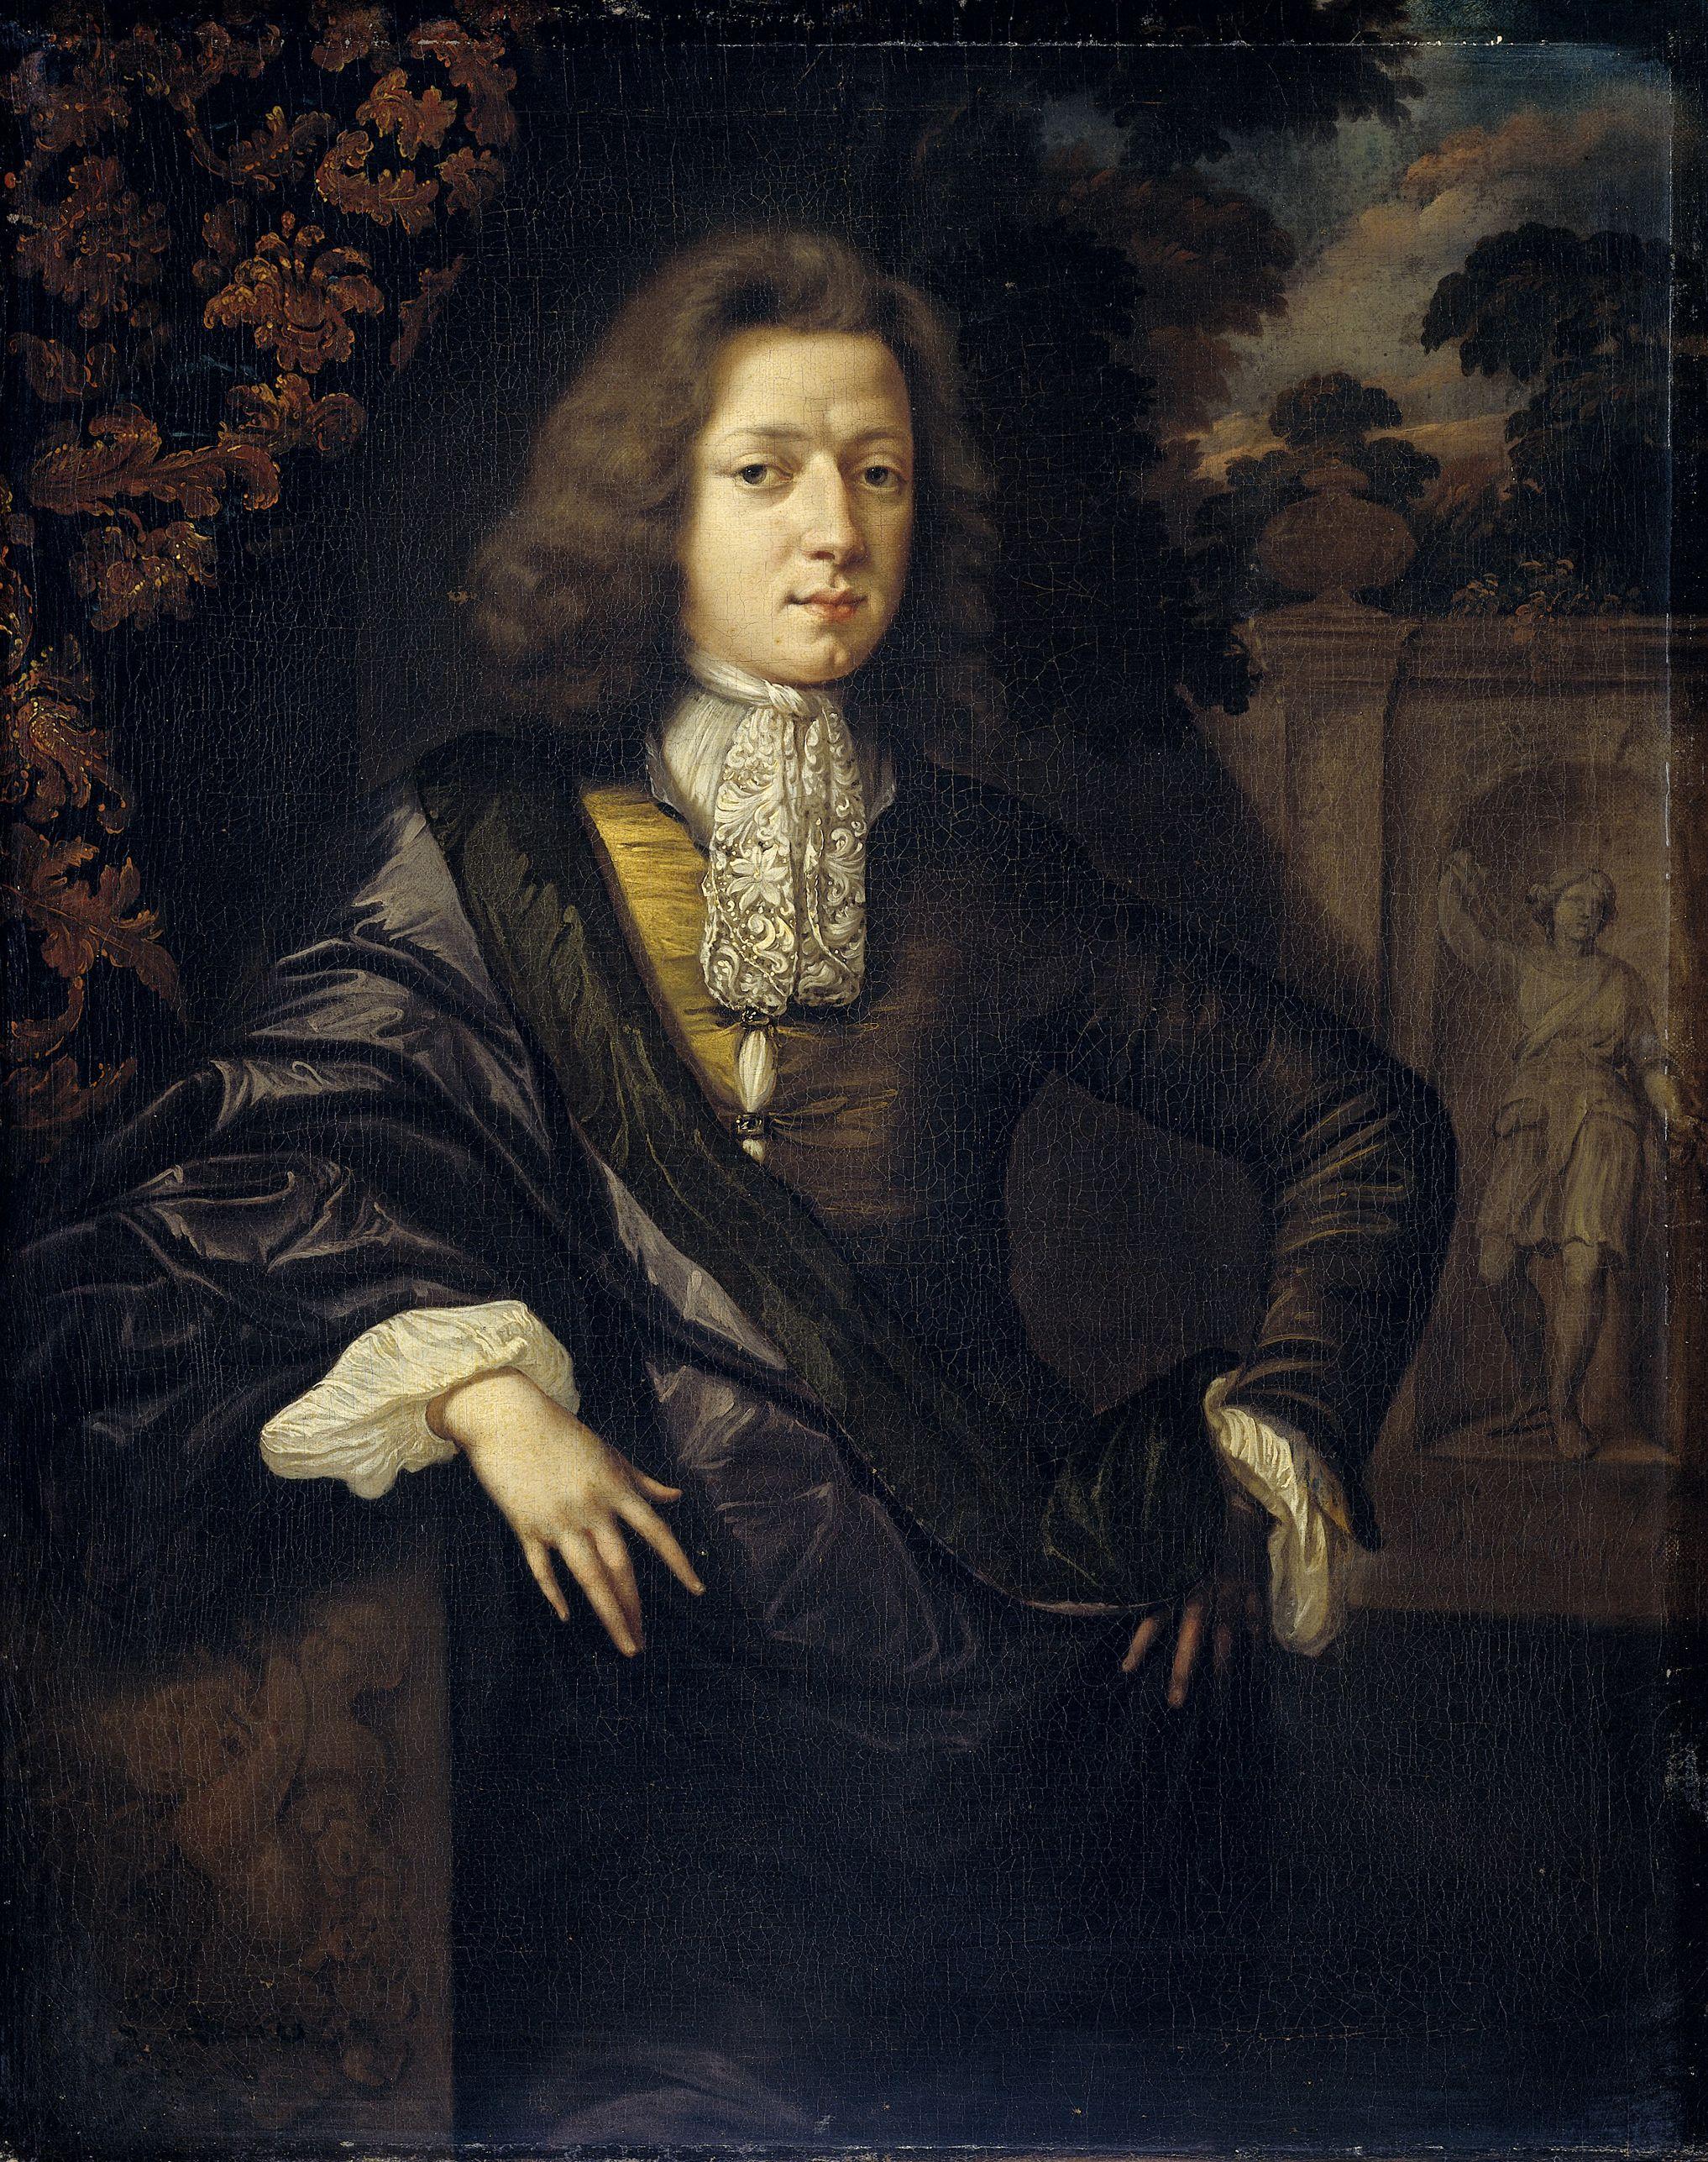 Daniël Haringh (1636 – 1713) Johan van Bochoven (1624-93) (JPEG Image, 2034×2574 pixels) - Scaled (22%)